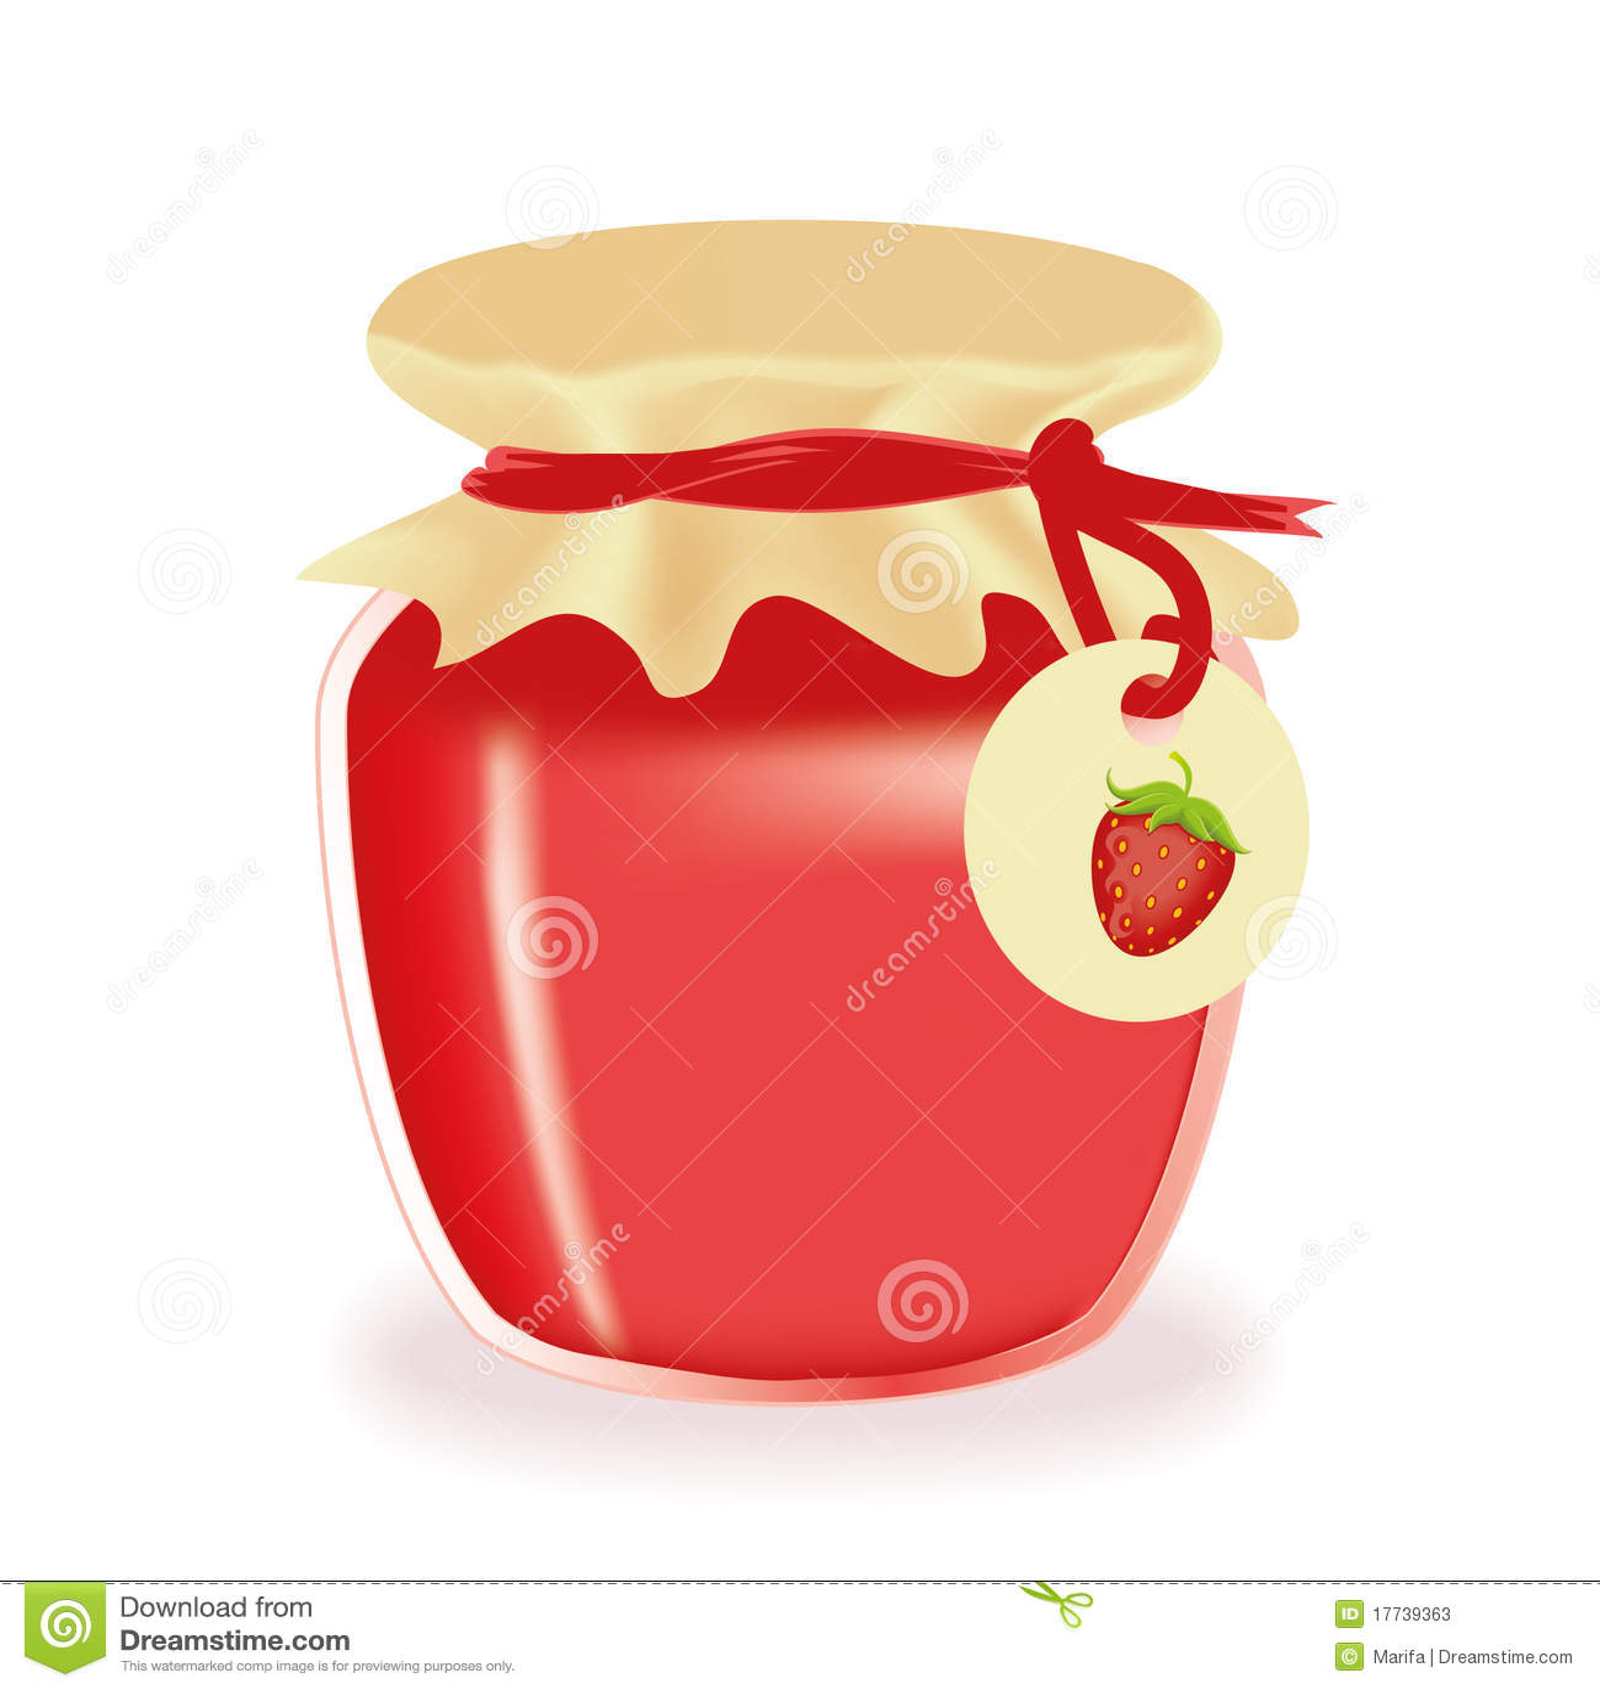 jar of strawberry jam stock vector illustration of